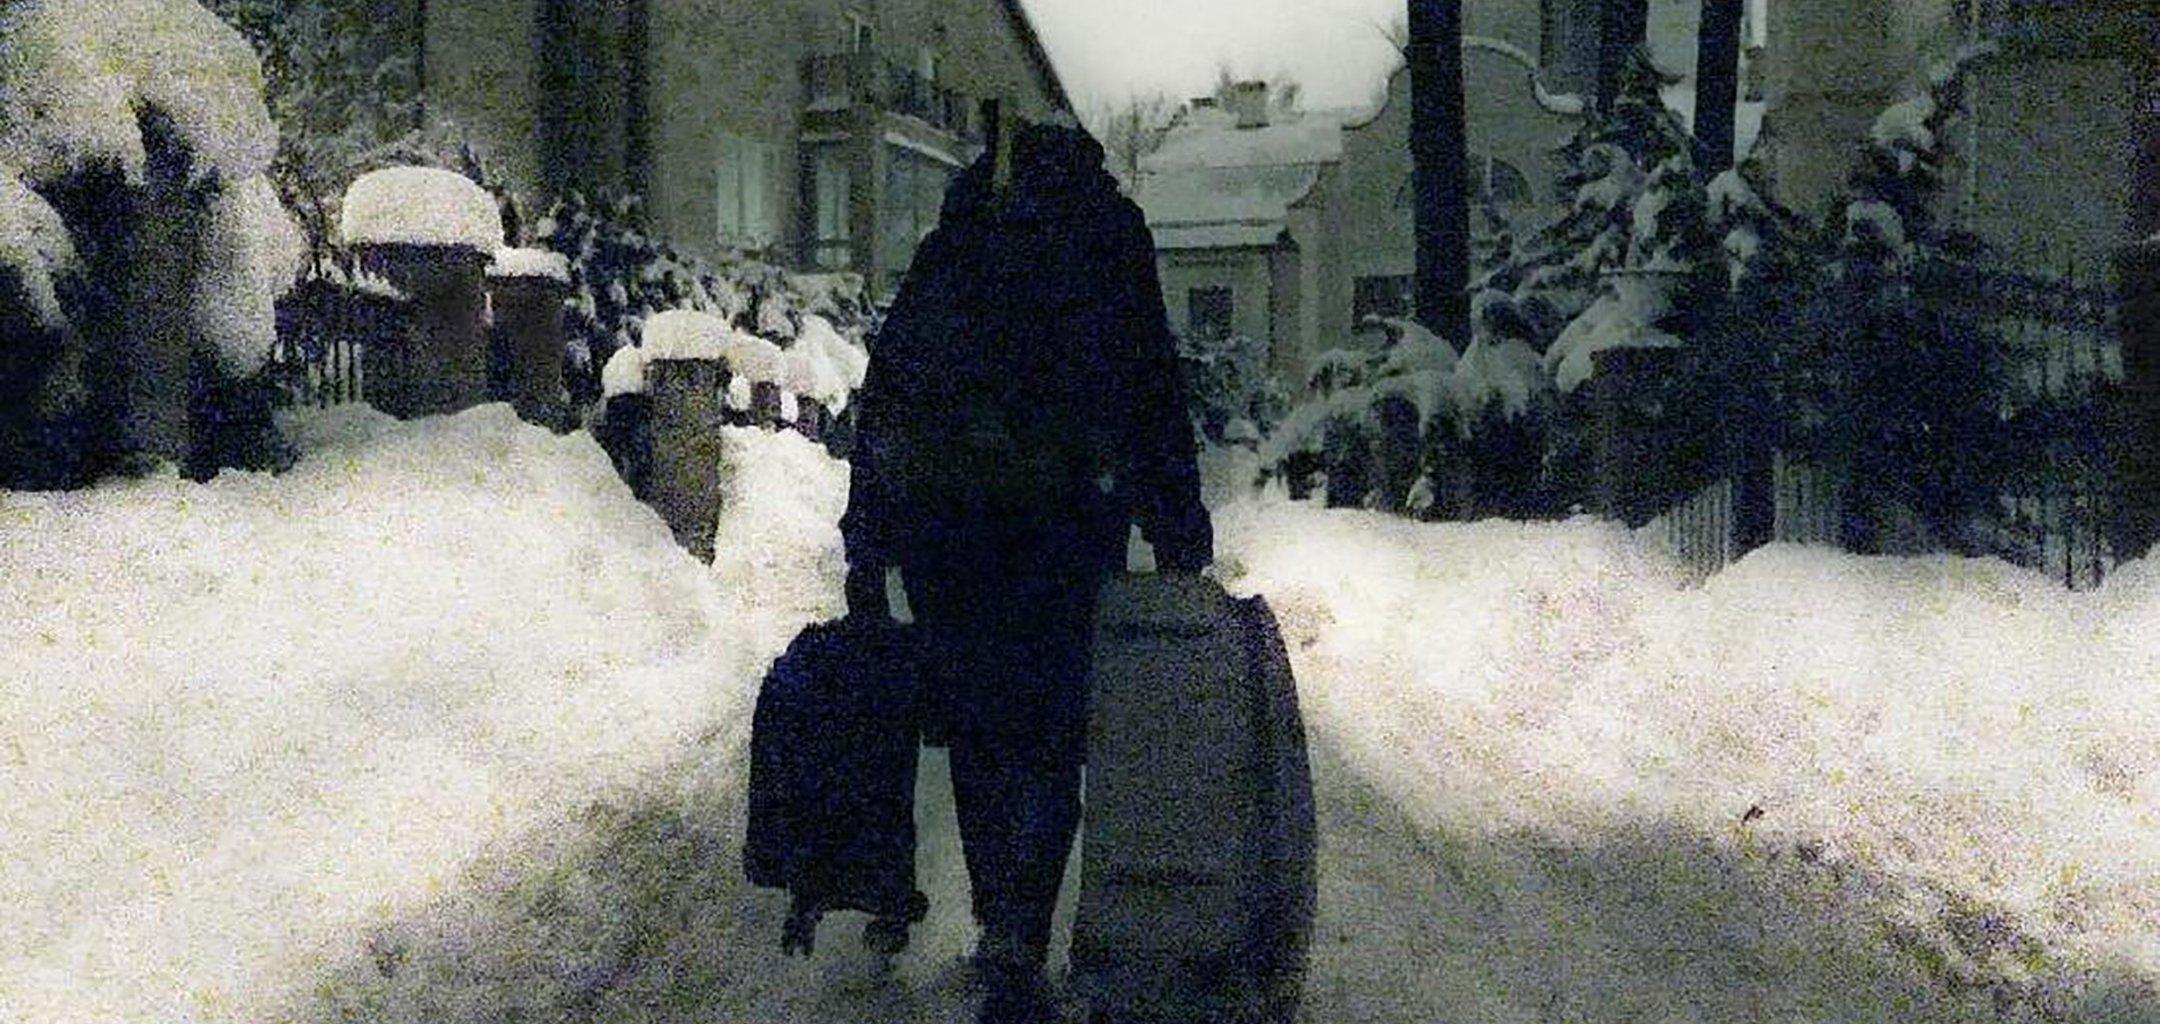 WTC snow 2160x1024